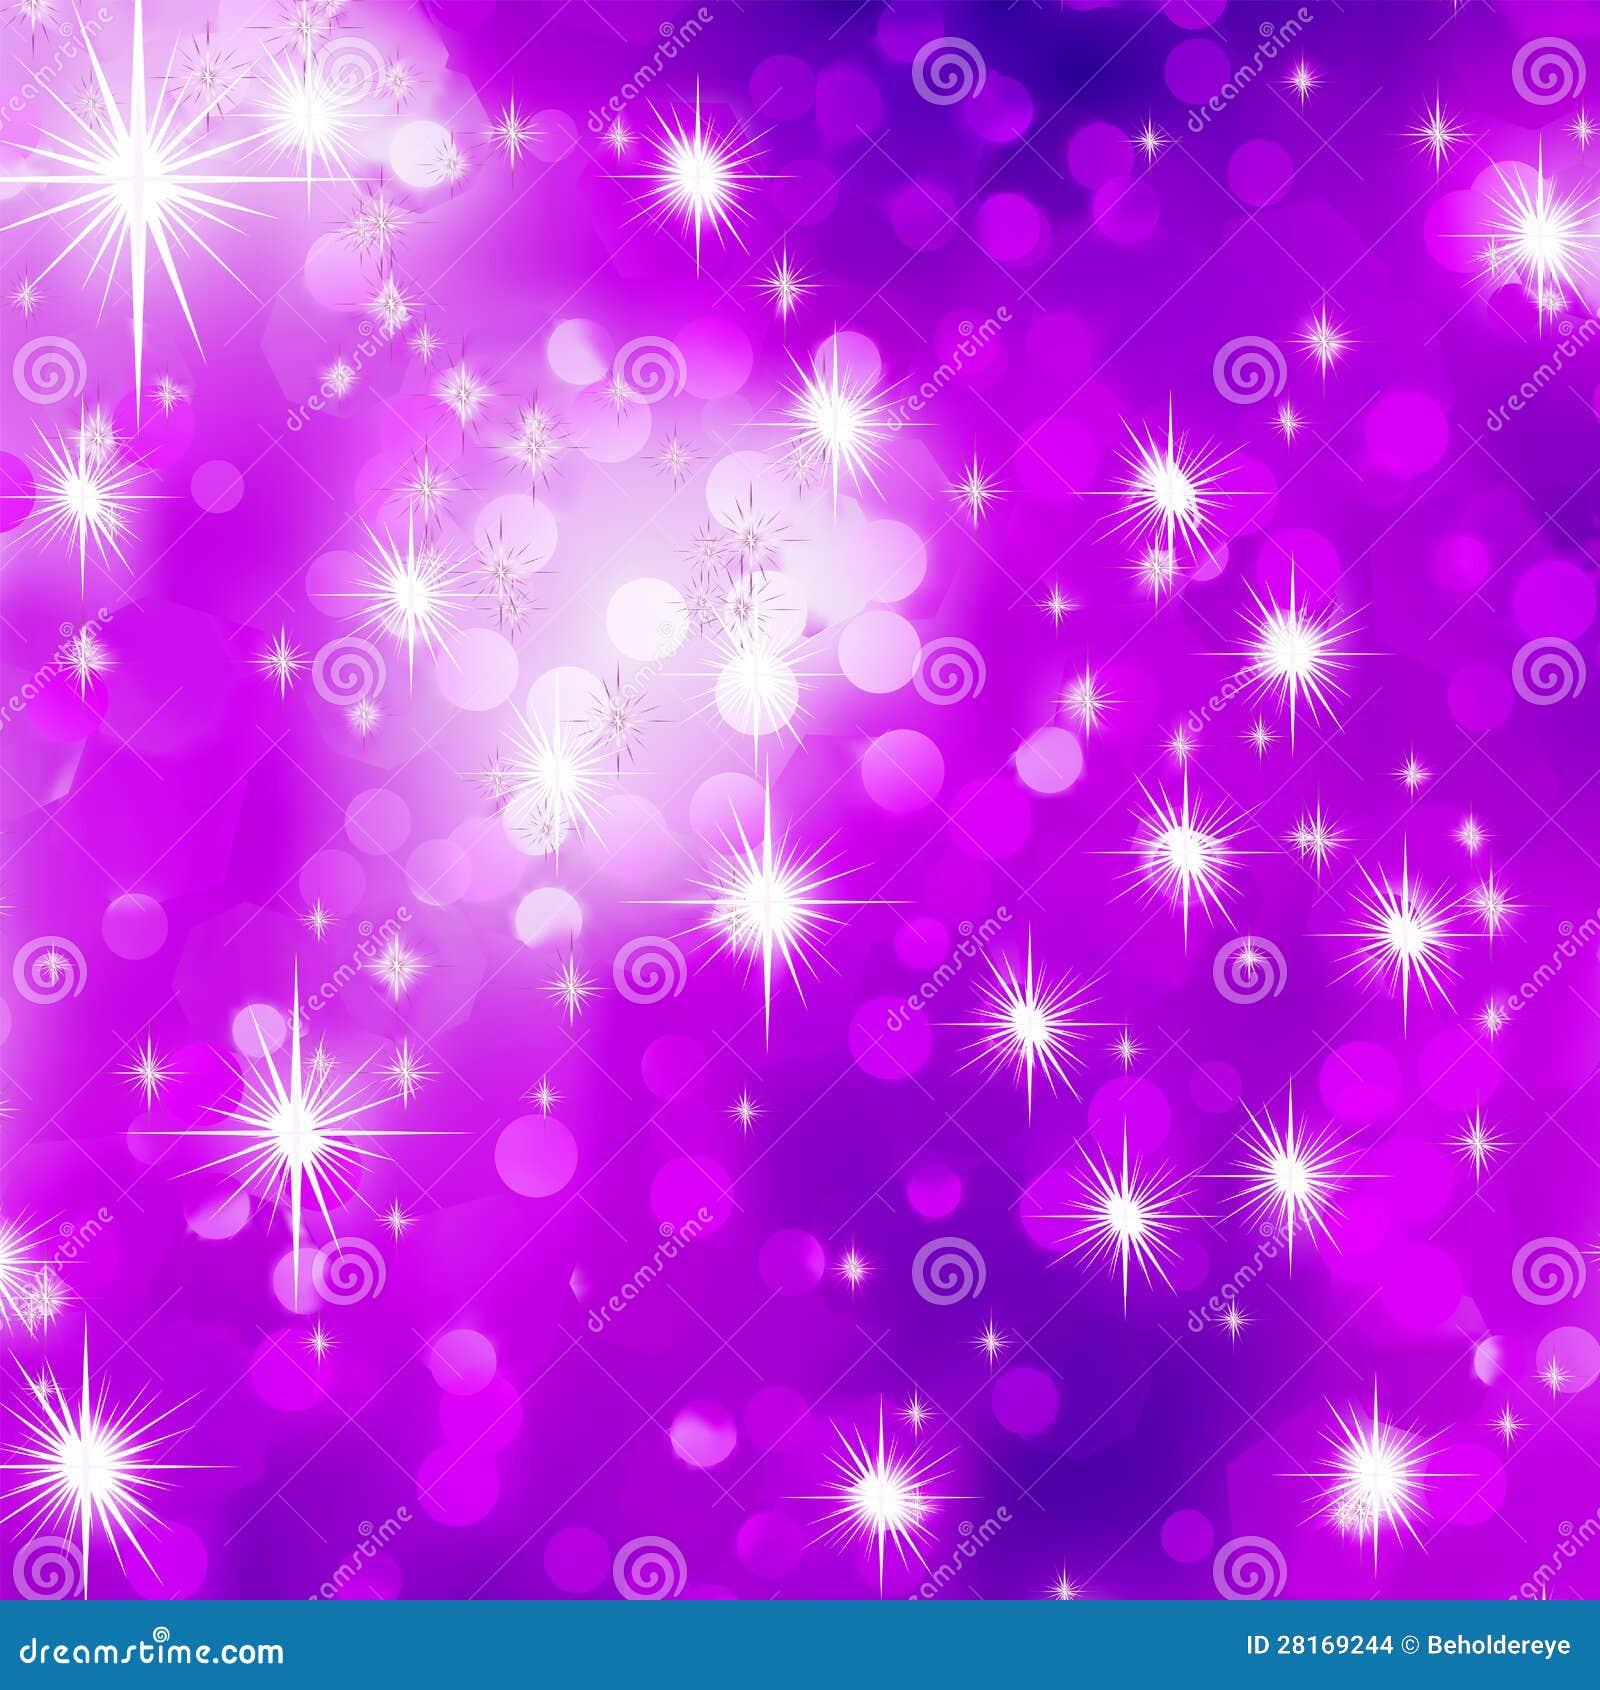 Glittery Purple Christmas Background. EPS 8 Stock Images - Image ...